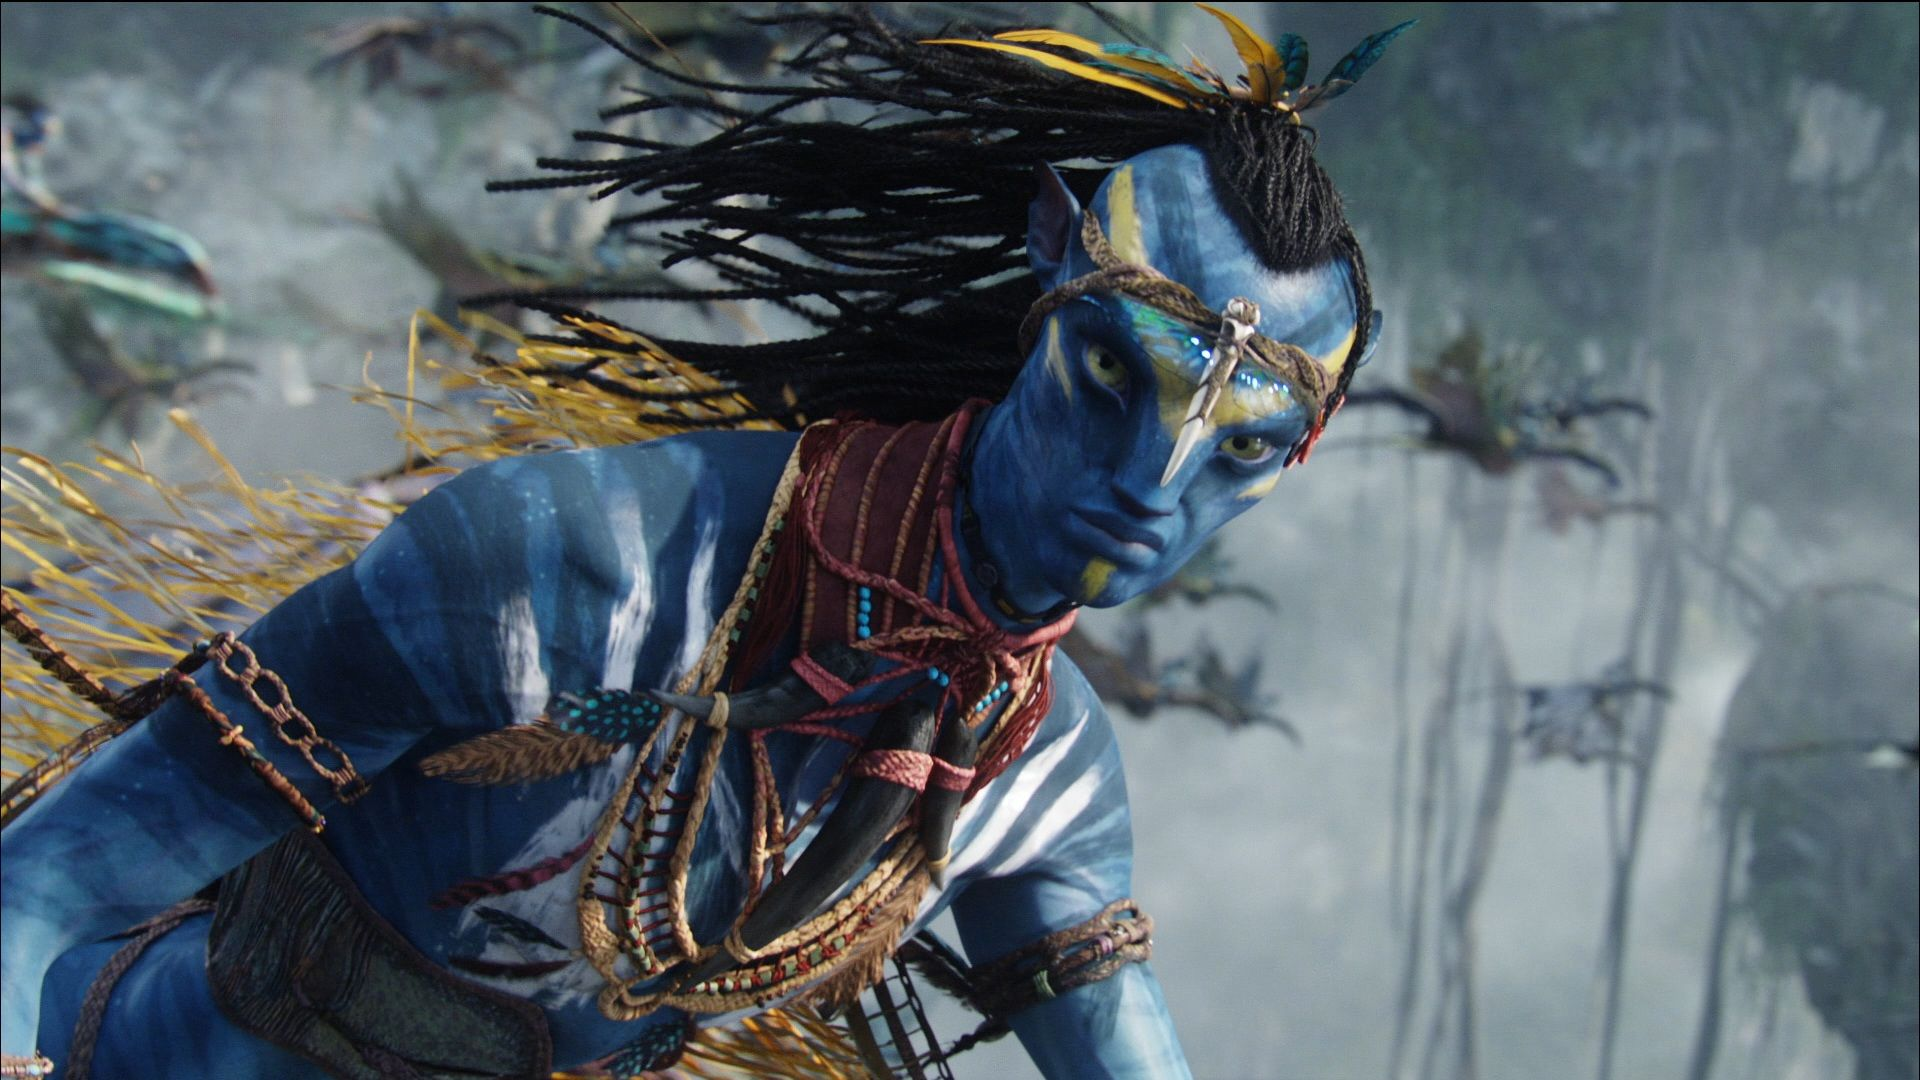 Blue Christmas Tree Forum Avatar: Avatar Tsu'tey Of The Na'vi